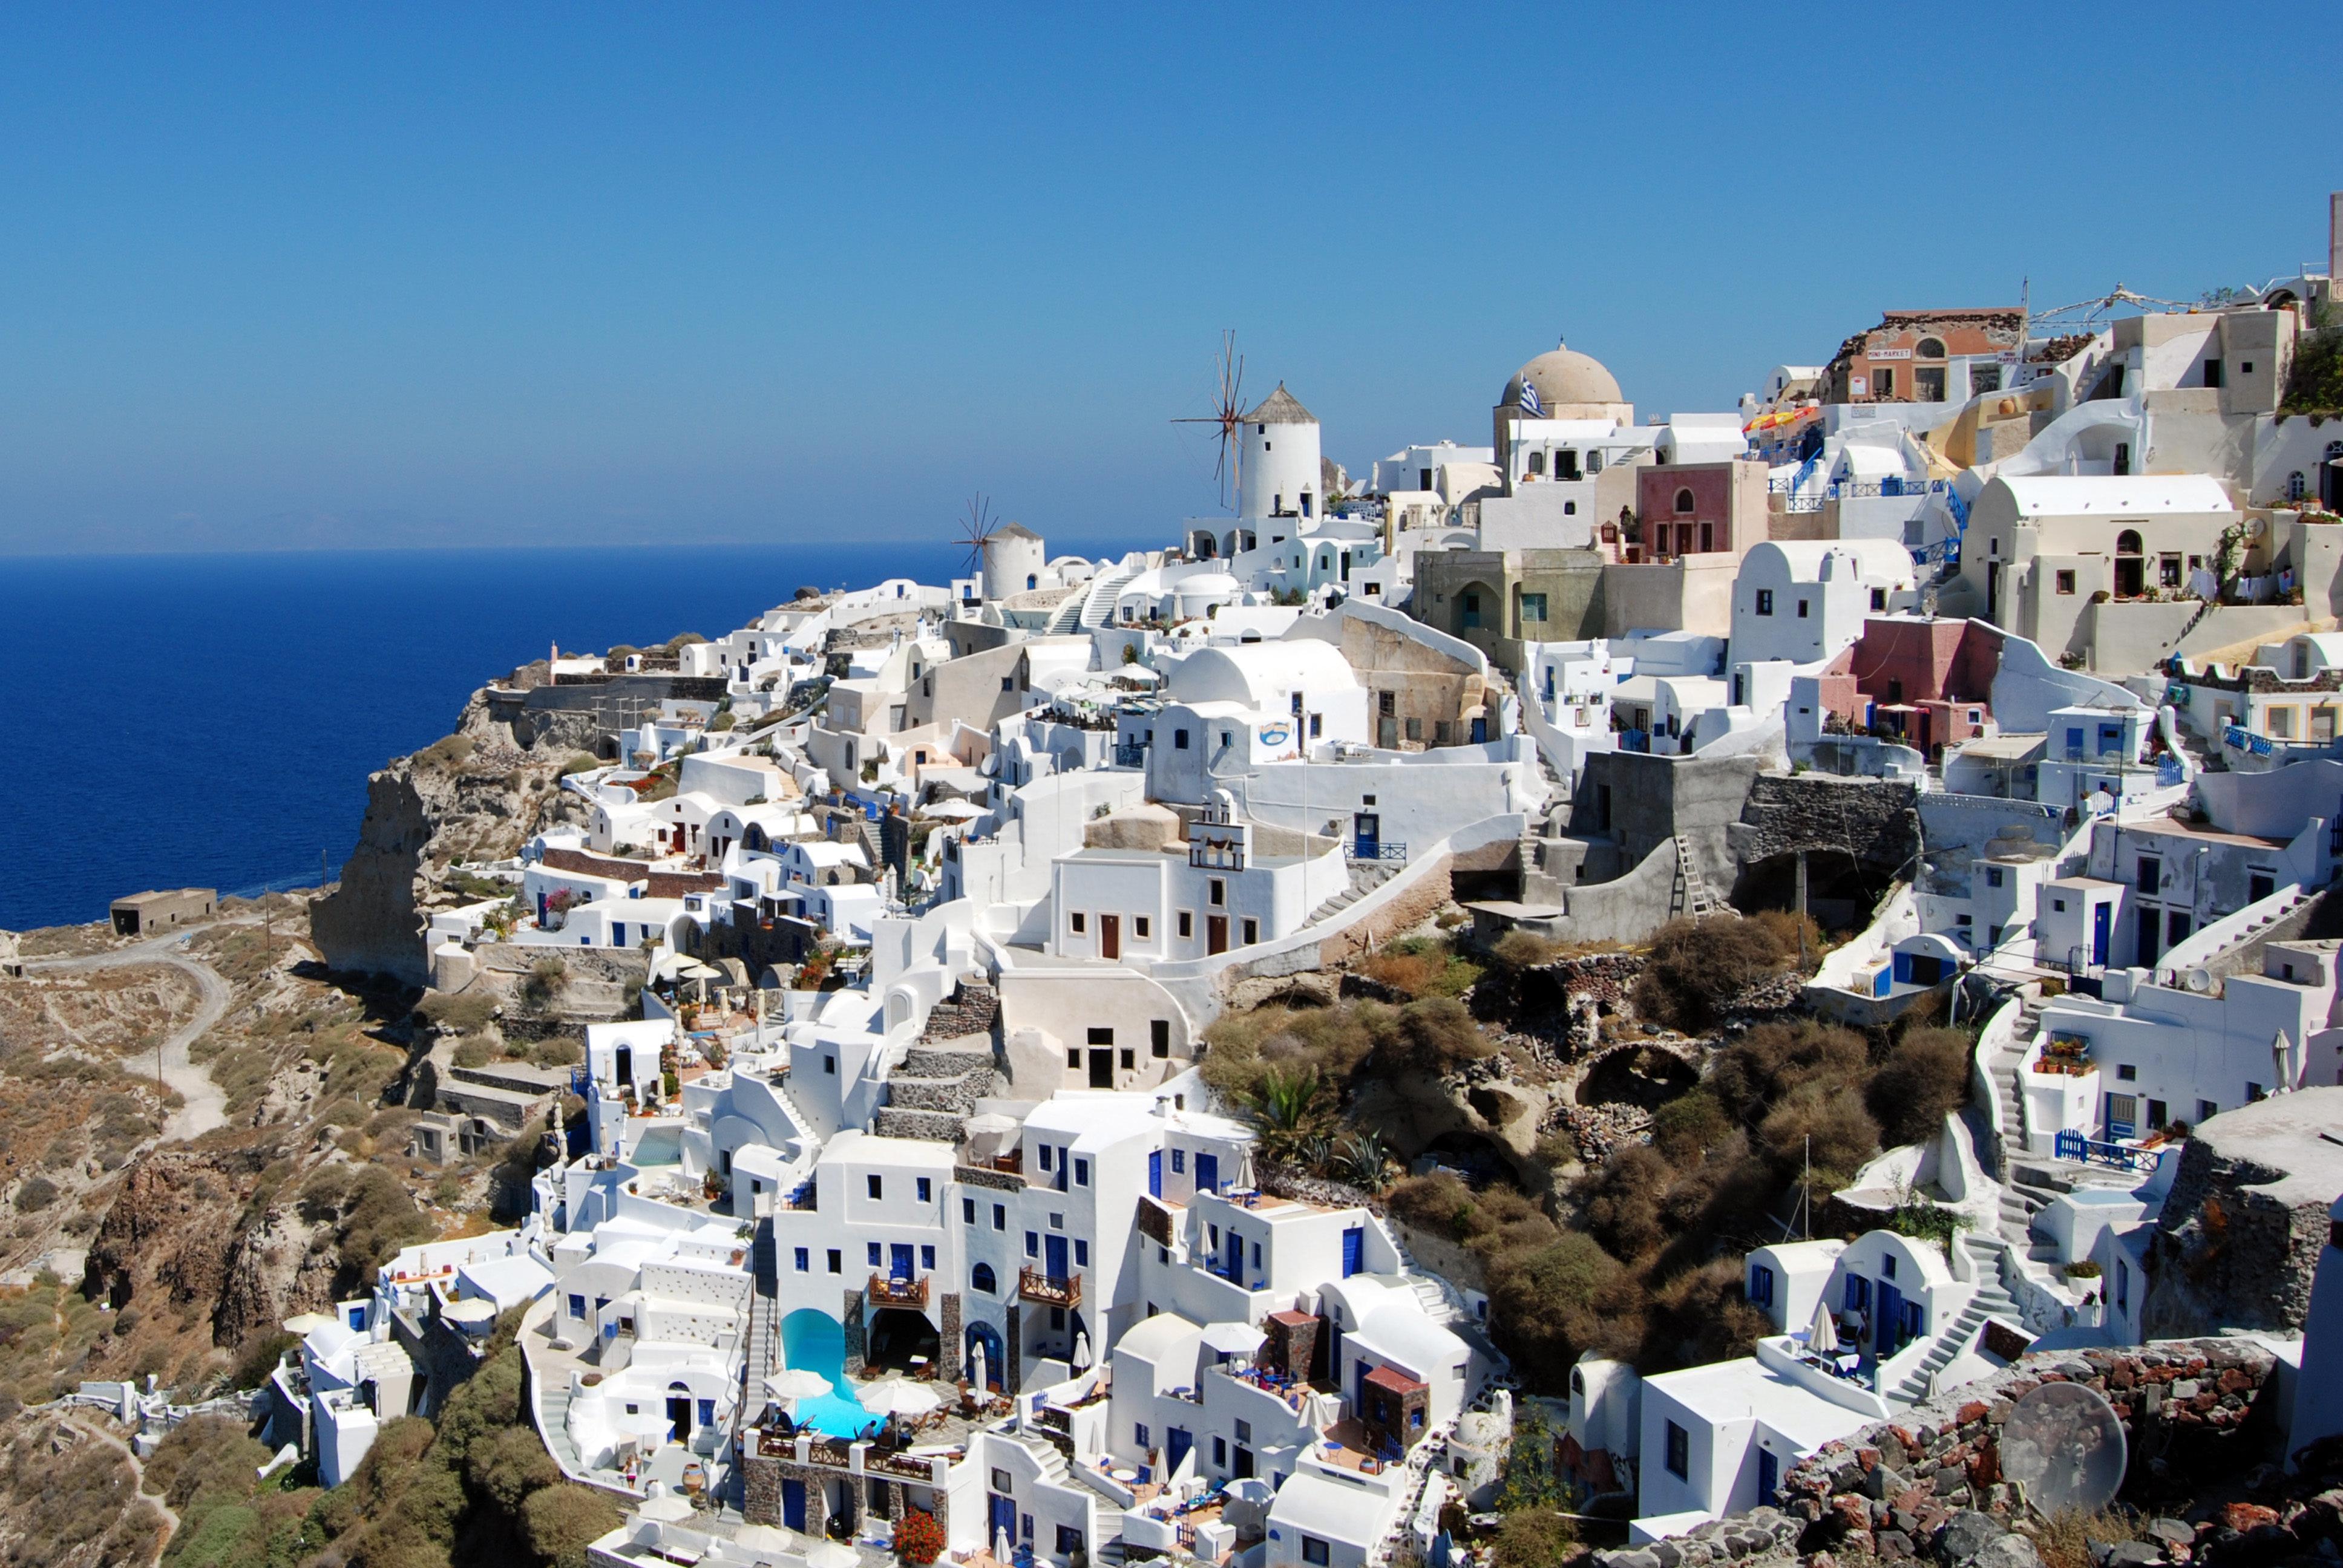 File:Santorini 07 02 09 0808.jpg